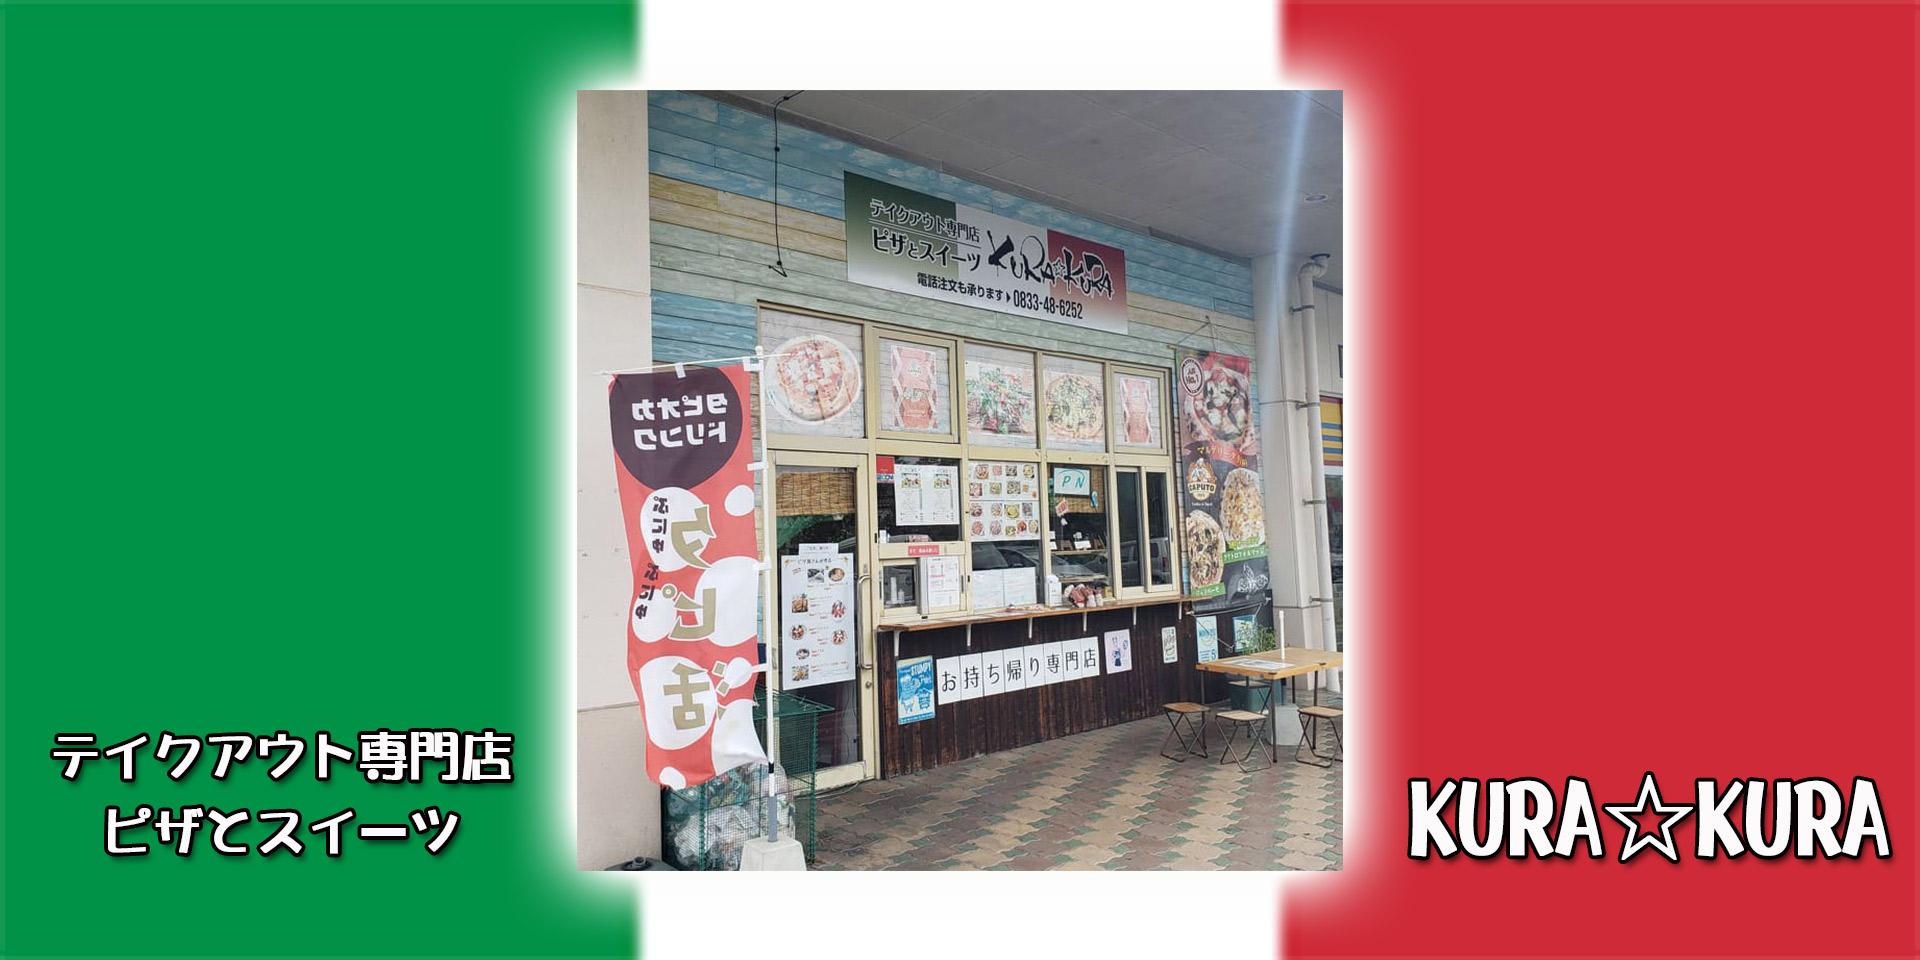 KURA☆KURA(クラクラ)